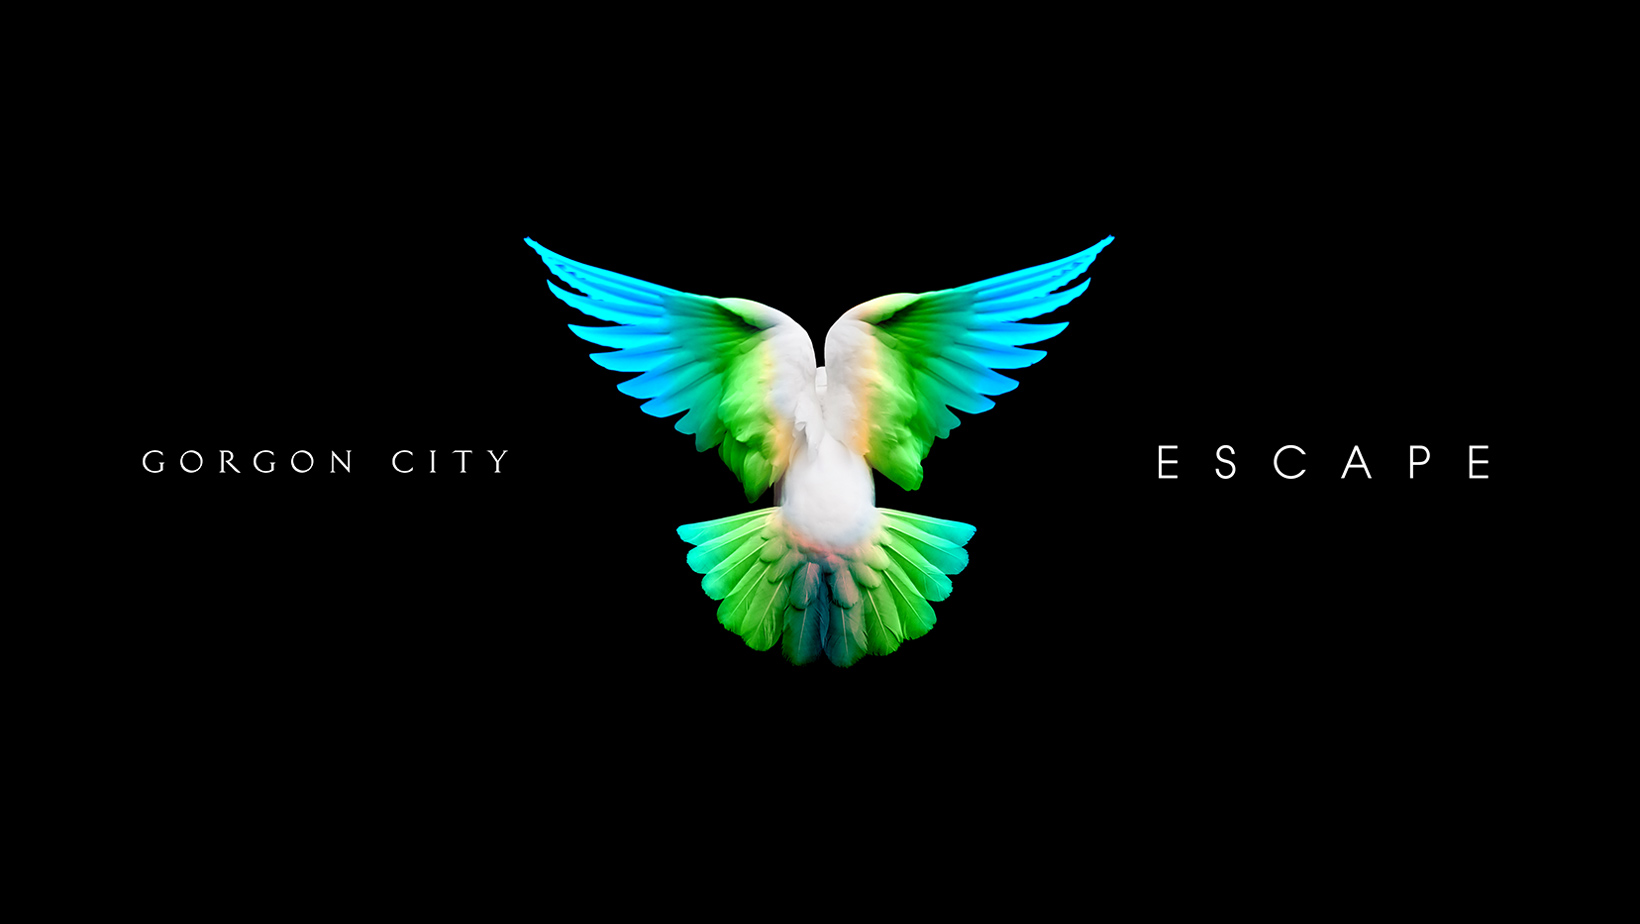 Gorgon City Escape.jpg